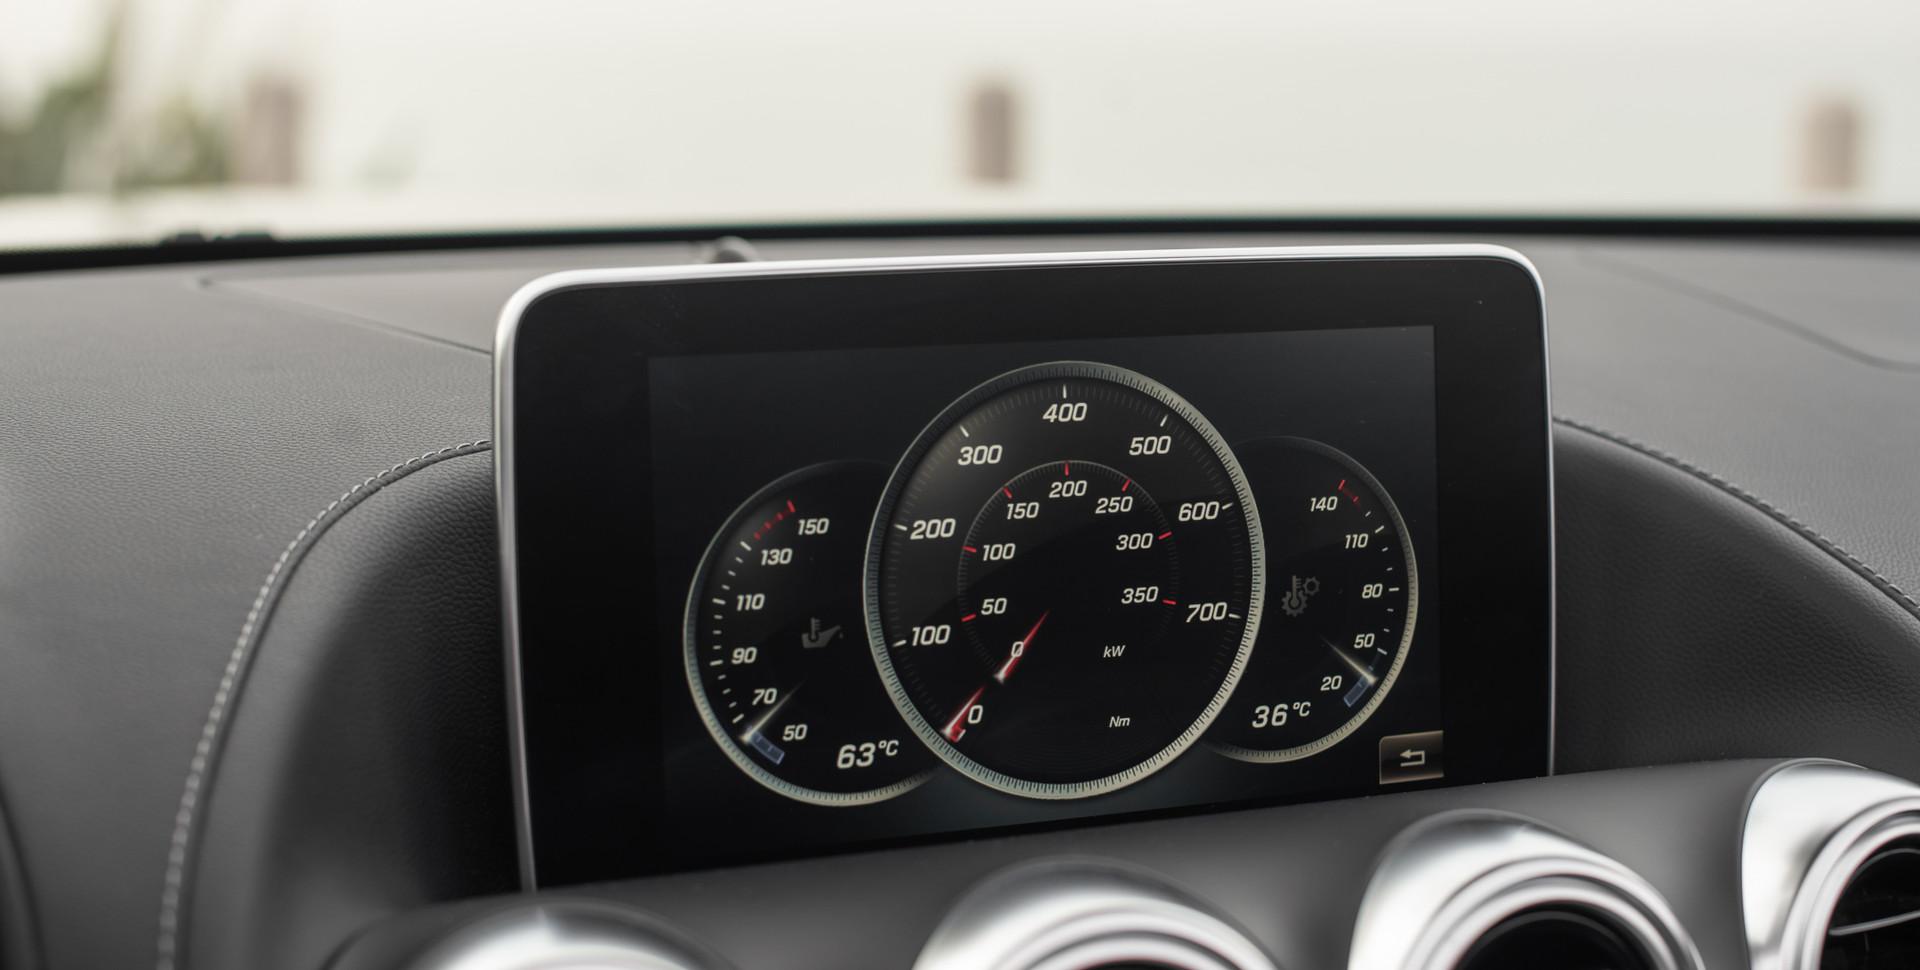 MB AMG GT Cabrio-23.jpg.JPG